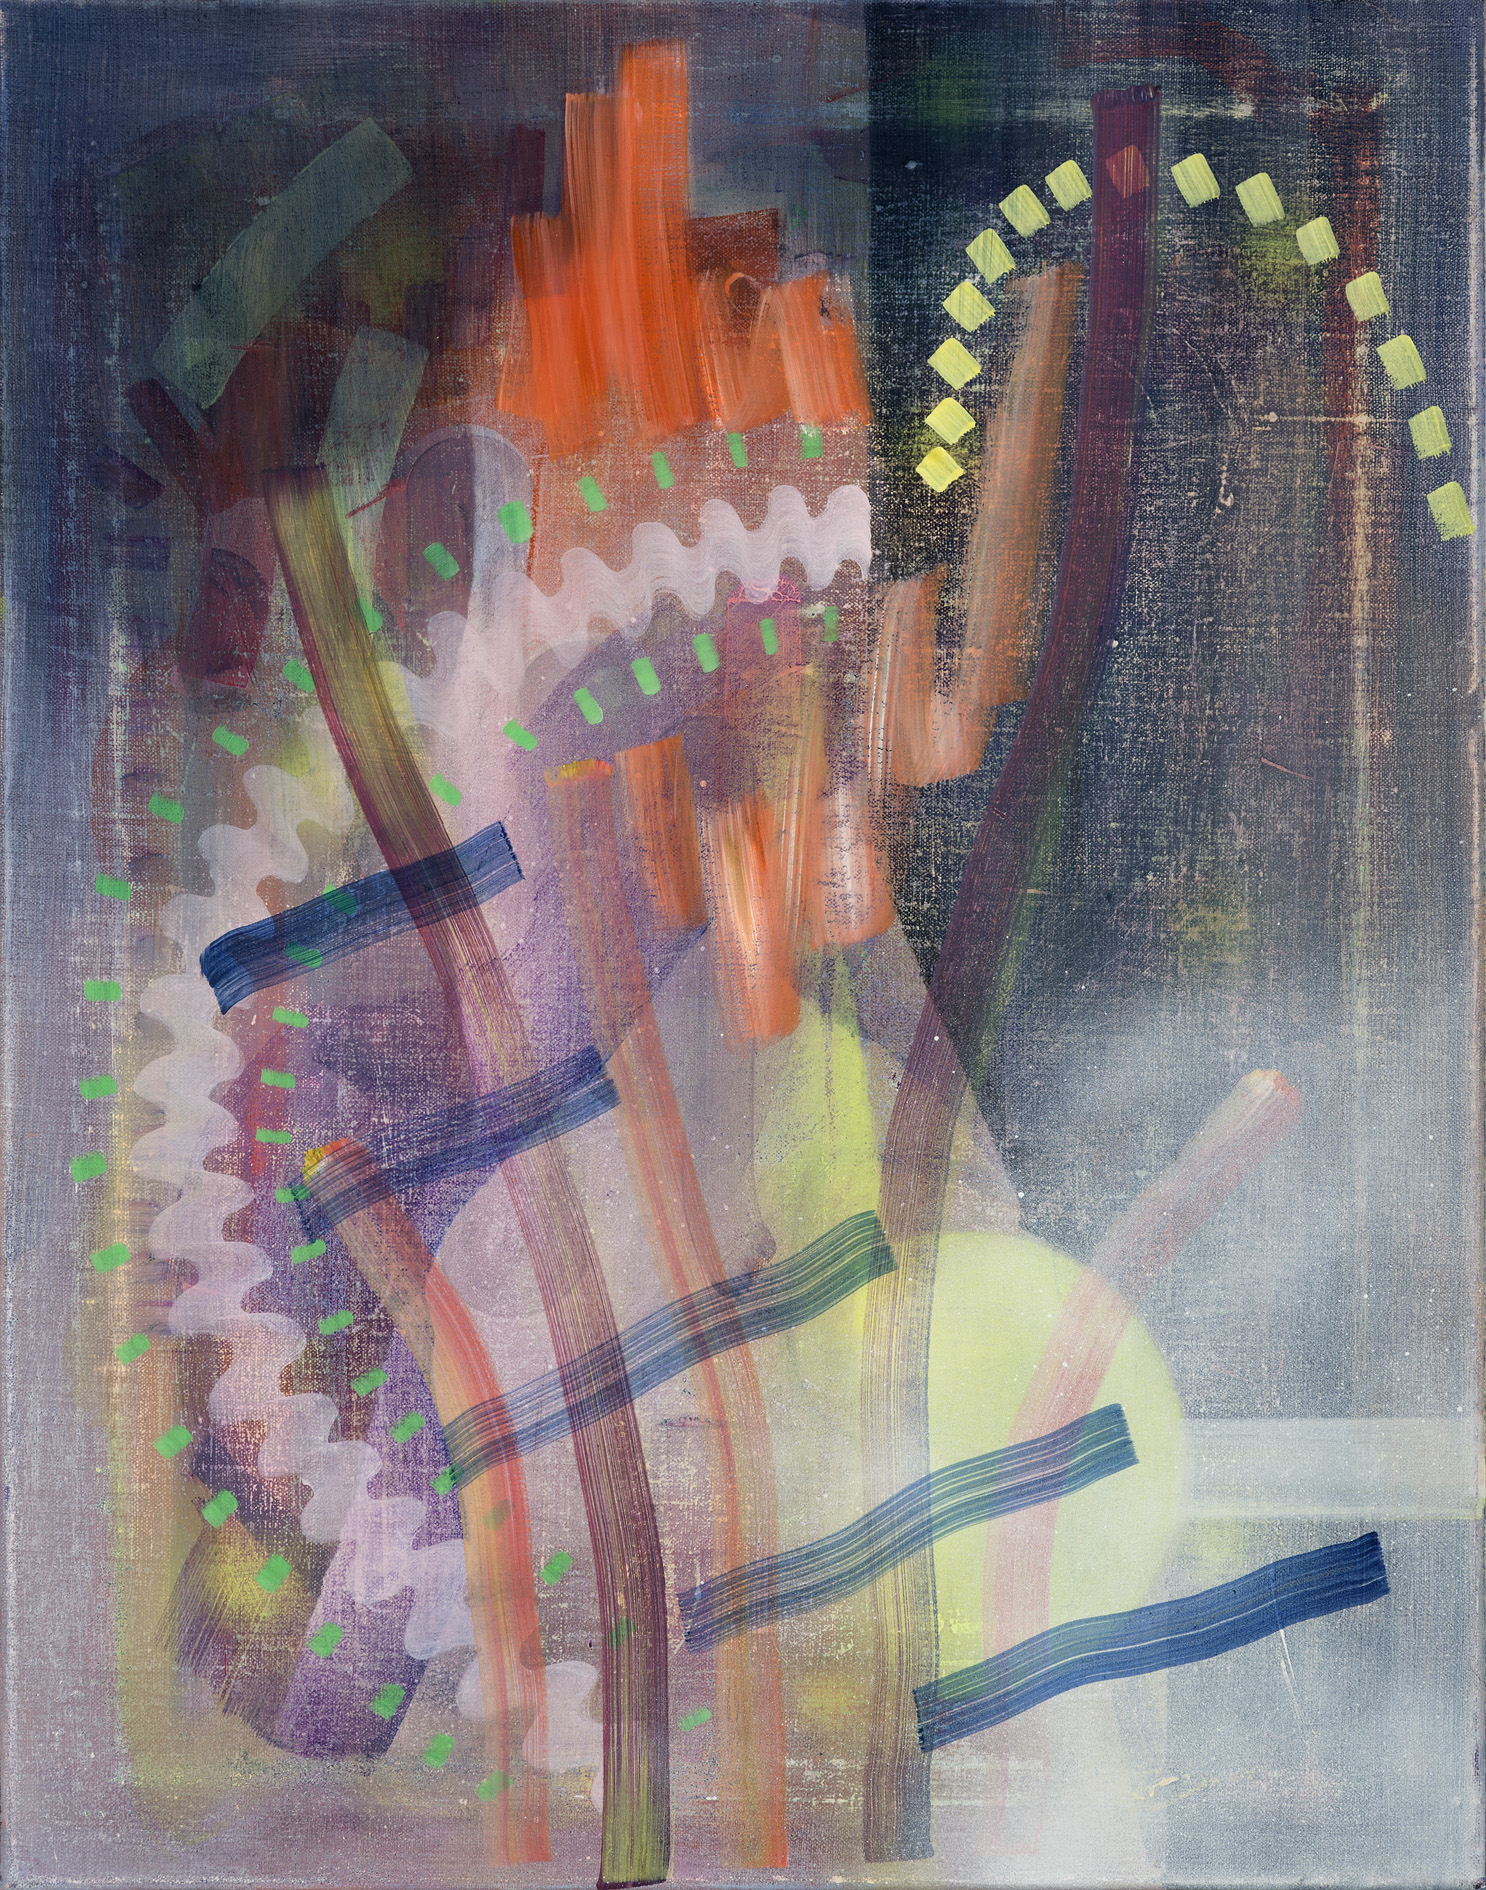 Untitled 11, oil on linen, 50cm x 40cm, 2016